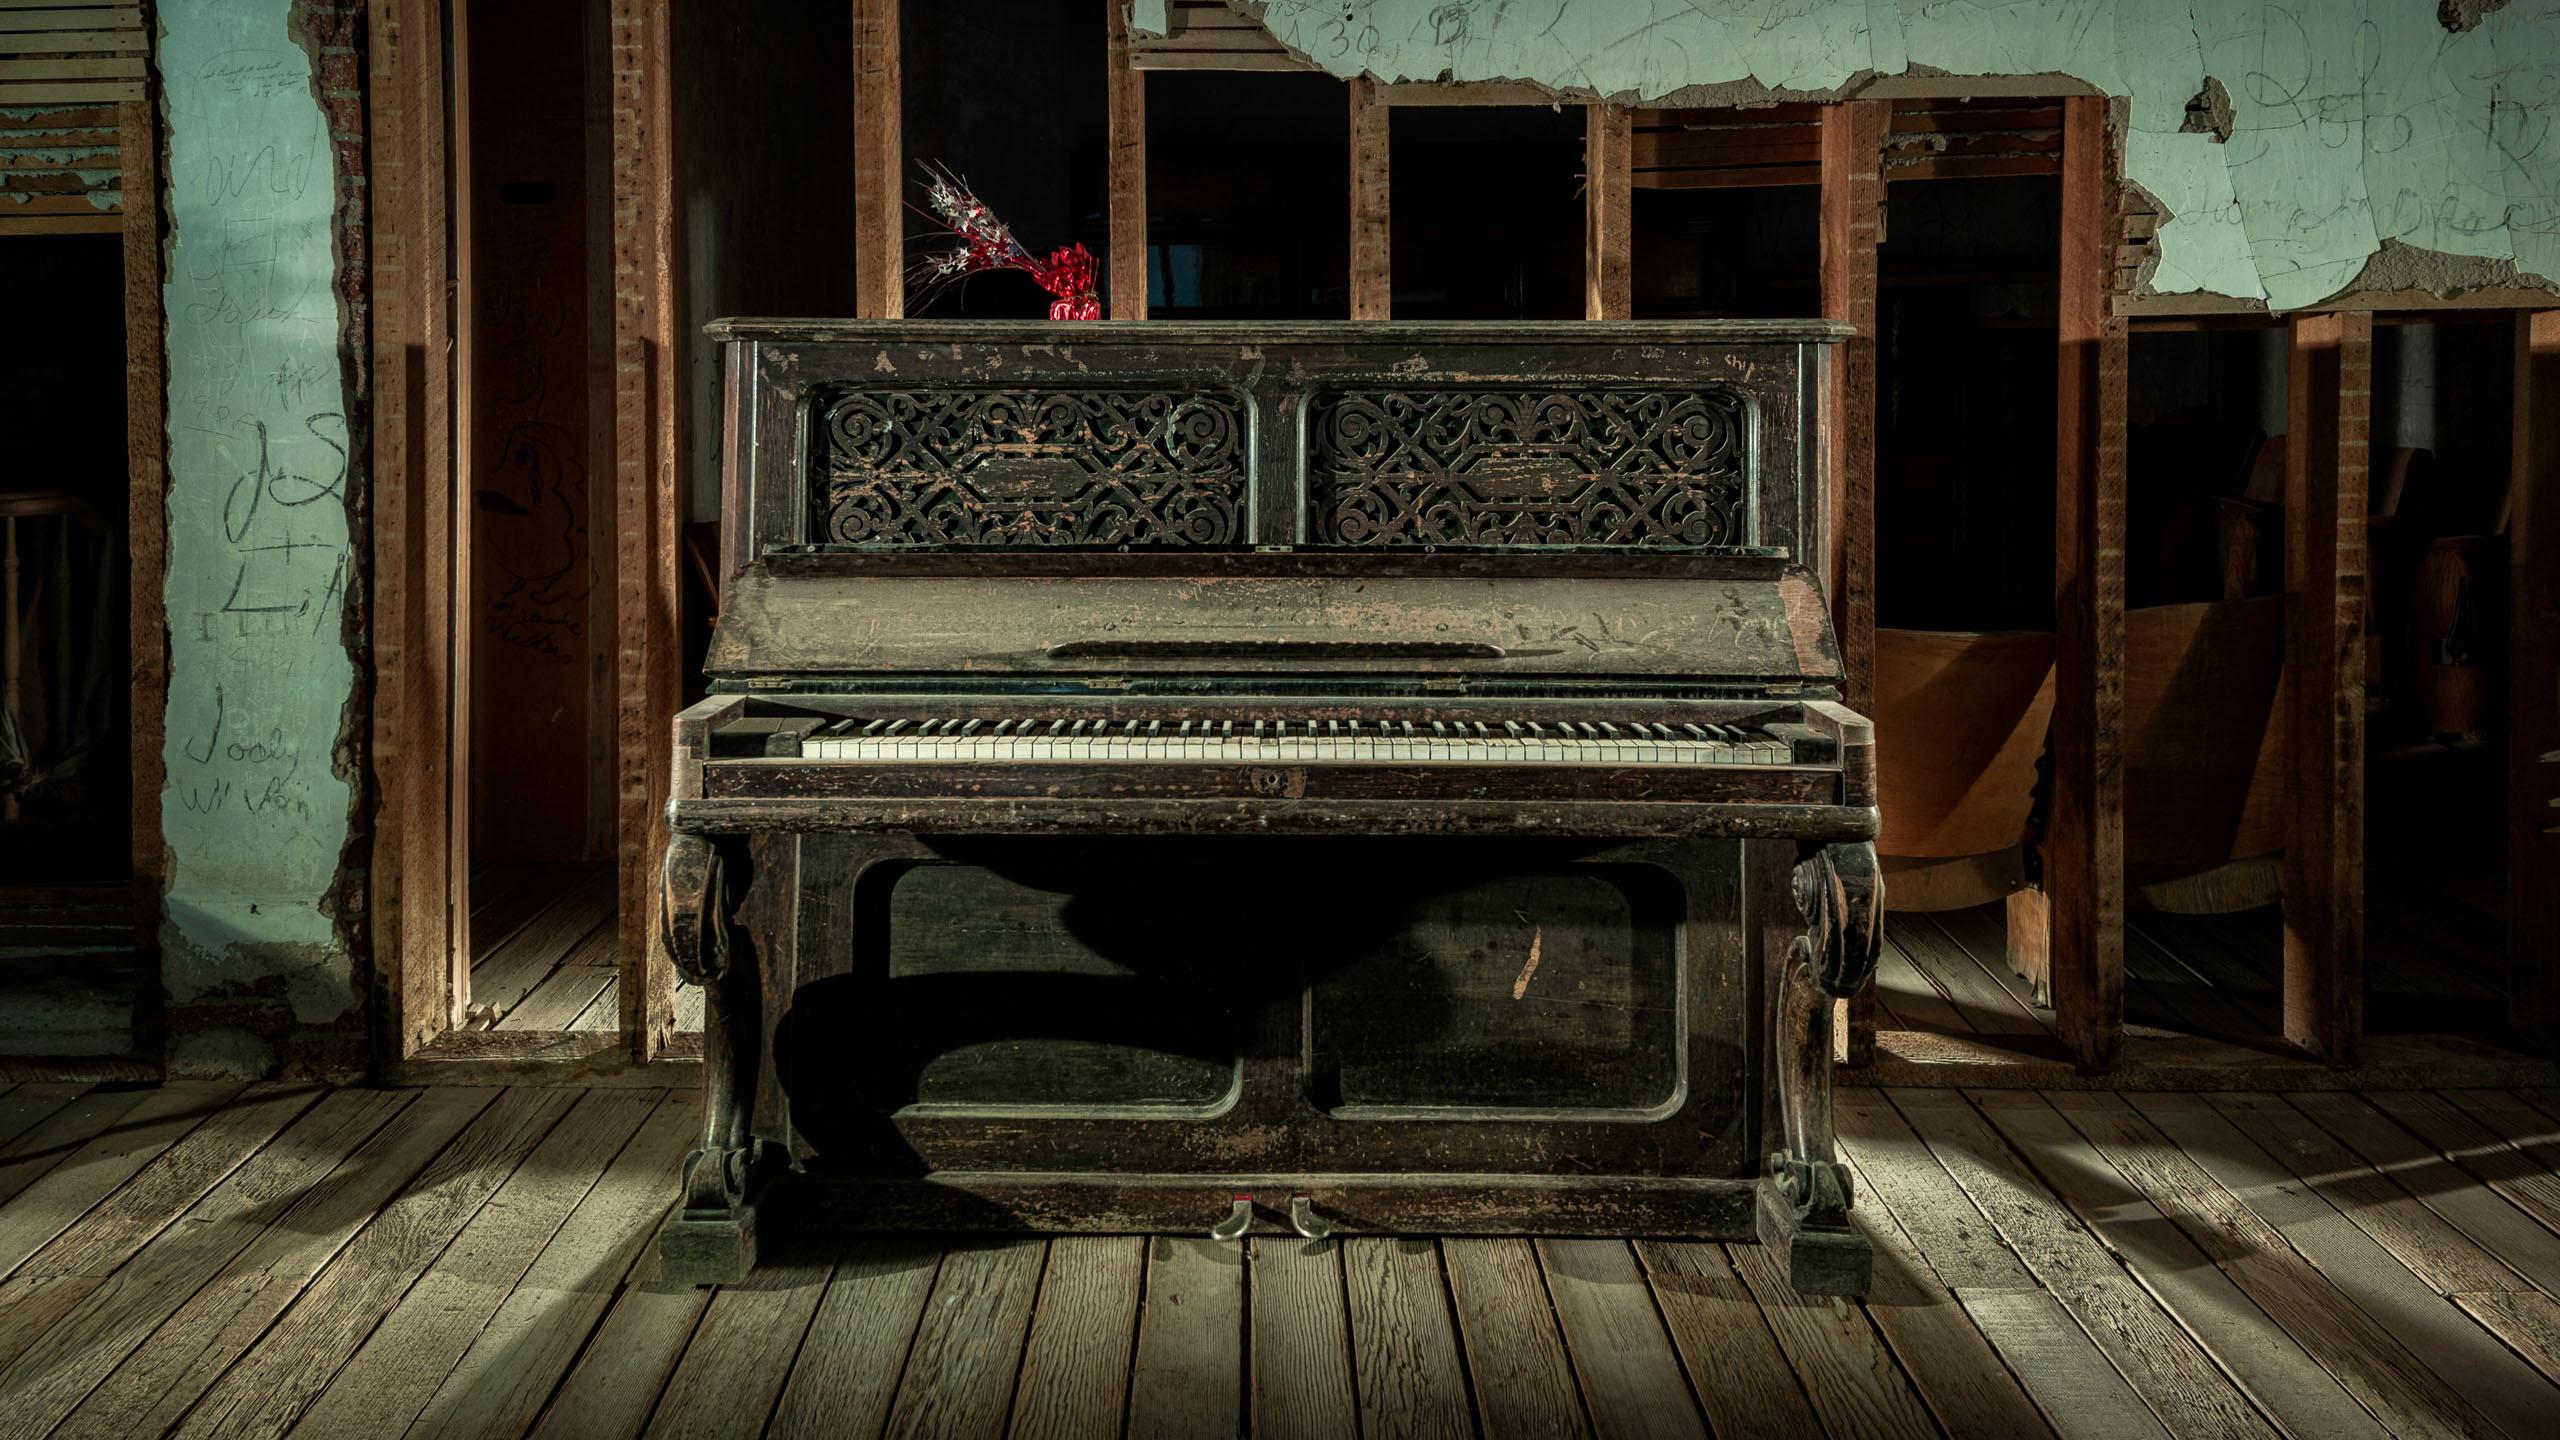 4194_kenlee_arizona-and-nevada_190718_2137_1mf8iso200_belmont-piano-straight 2650x1440px HEADER PHOTOFOCUS